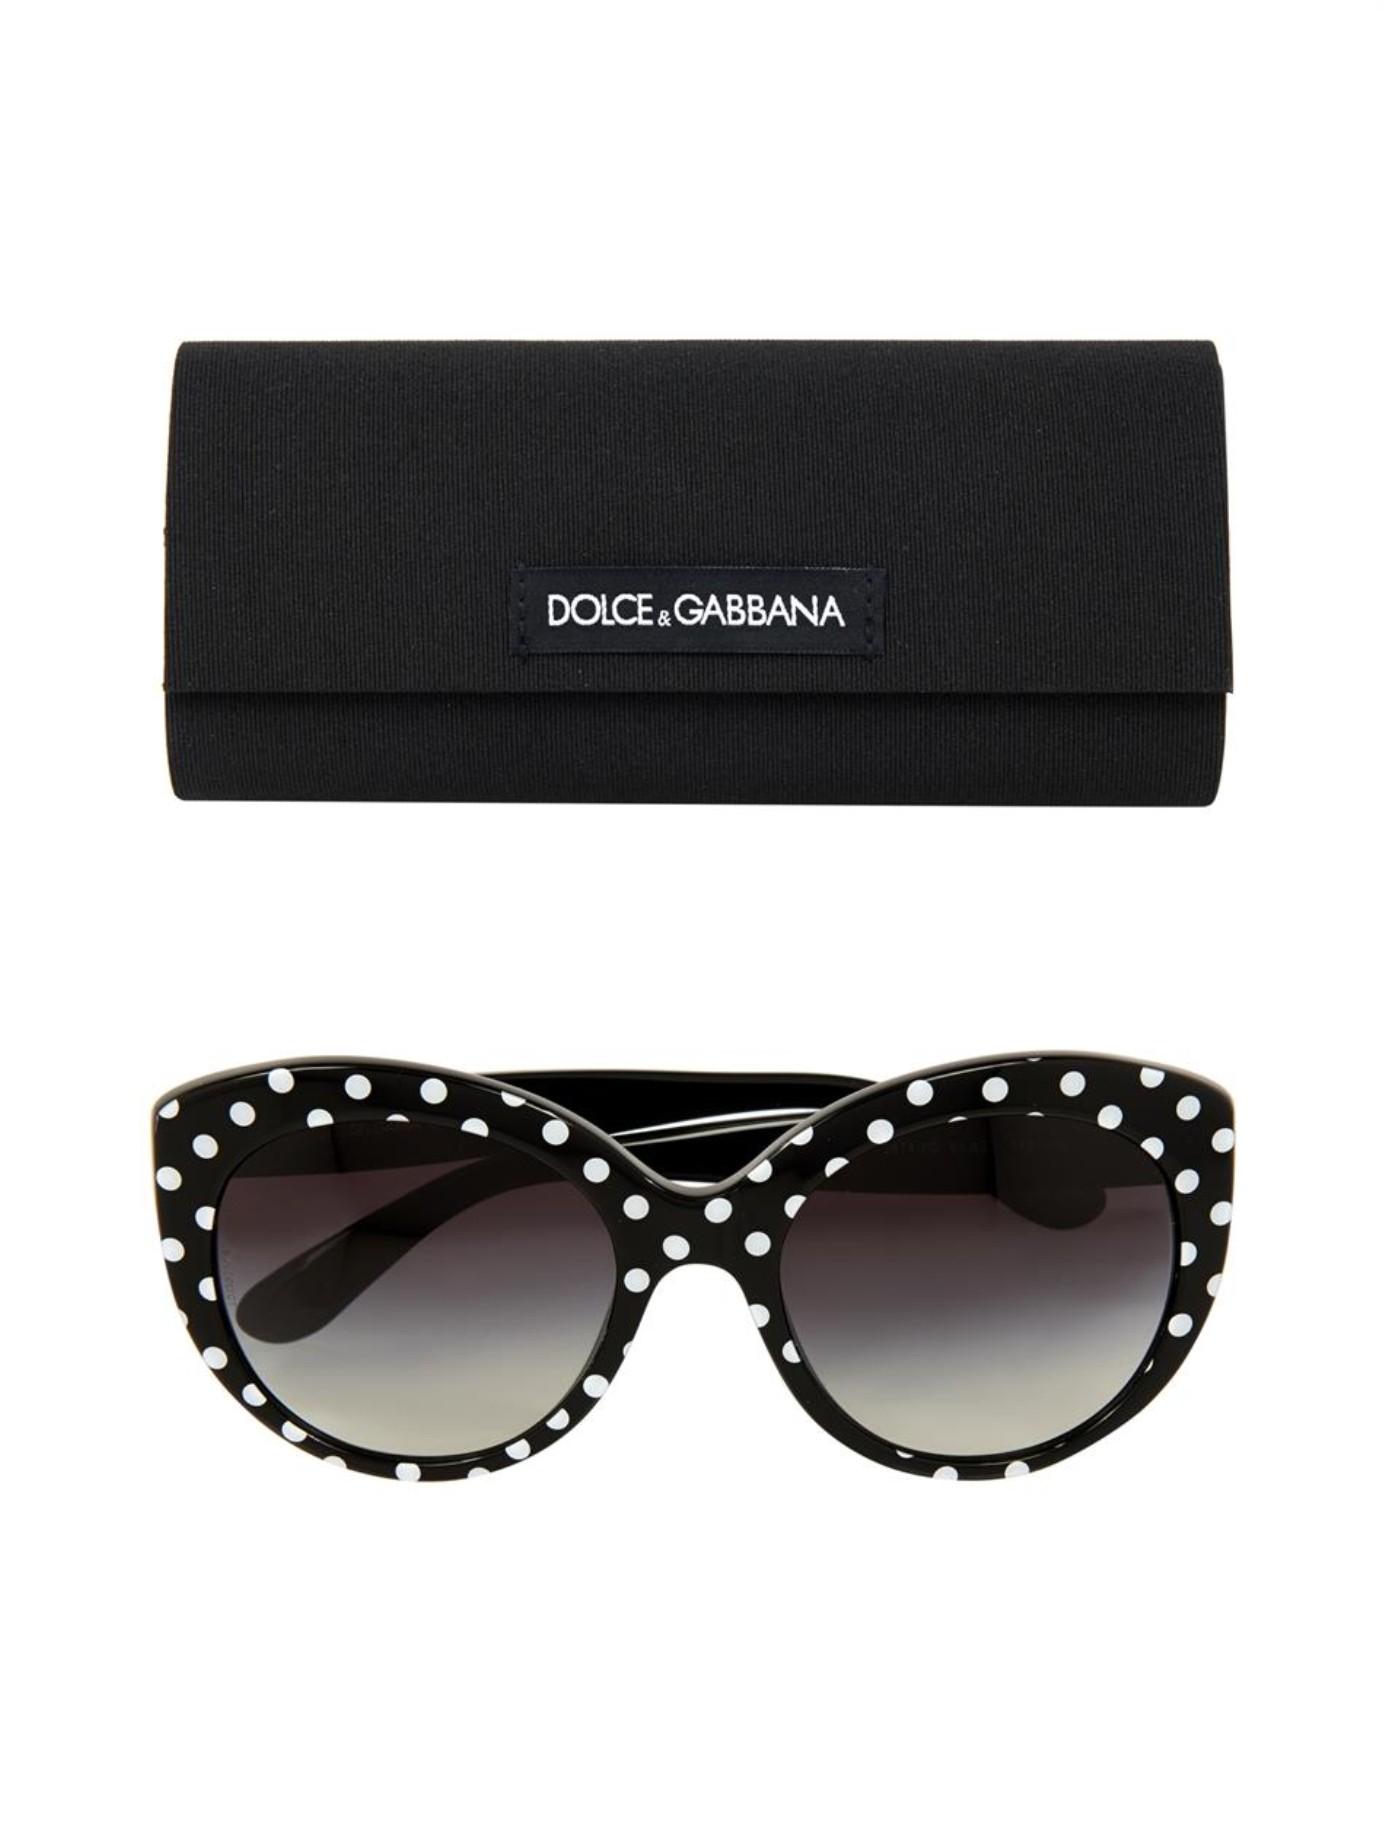 Dolce And Gabbana White Frame Glasses : Dolce & gabbana Polka-Dot Round-Framed Sunglasses in Black ...